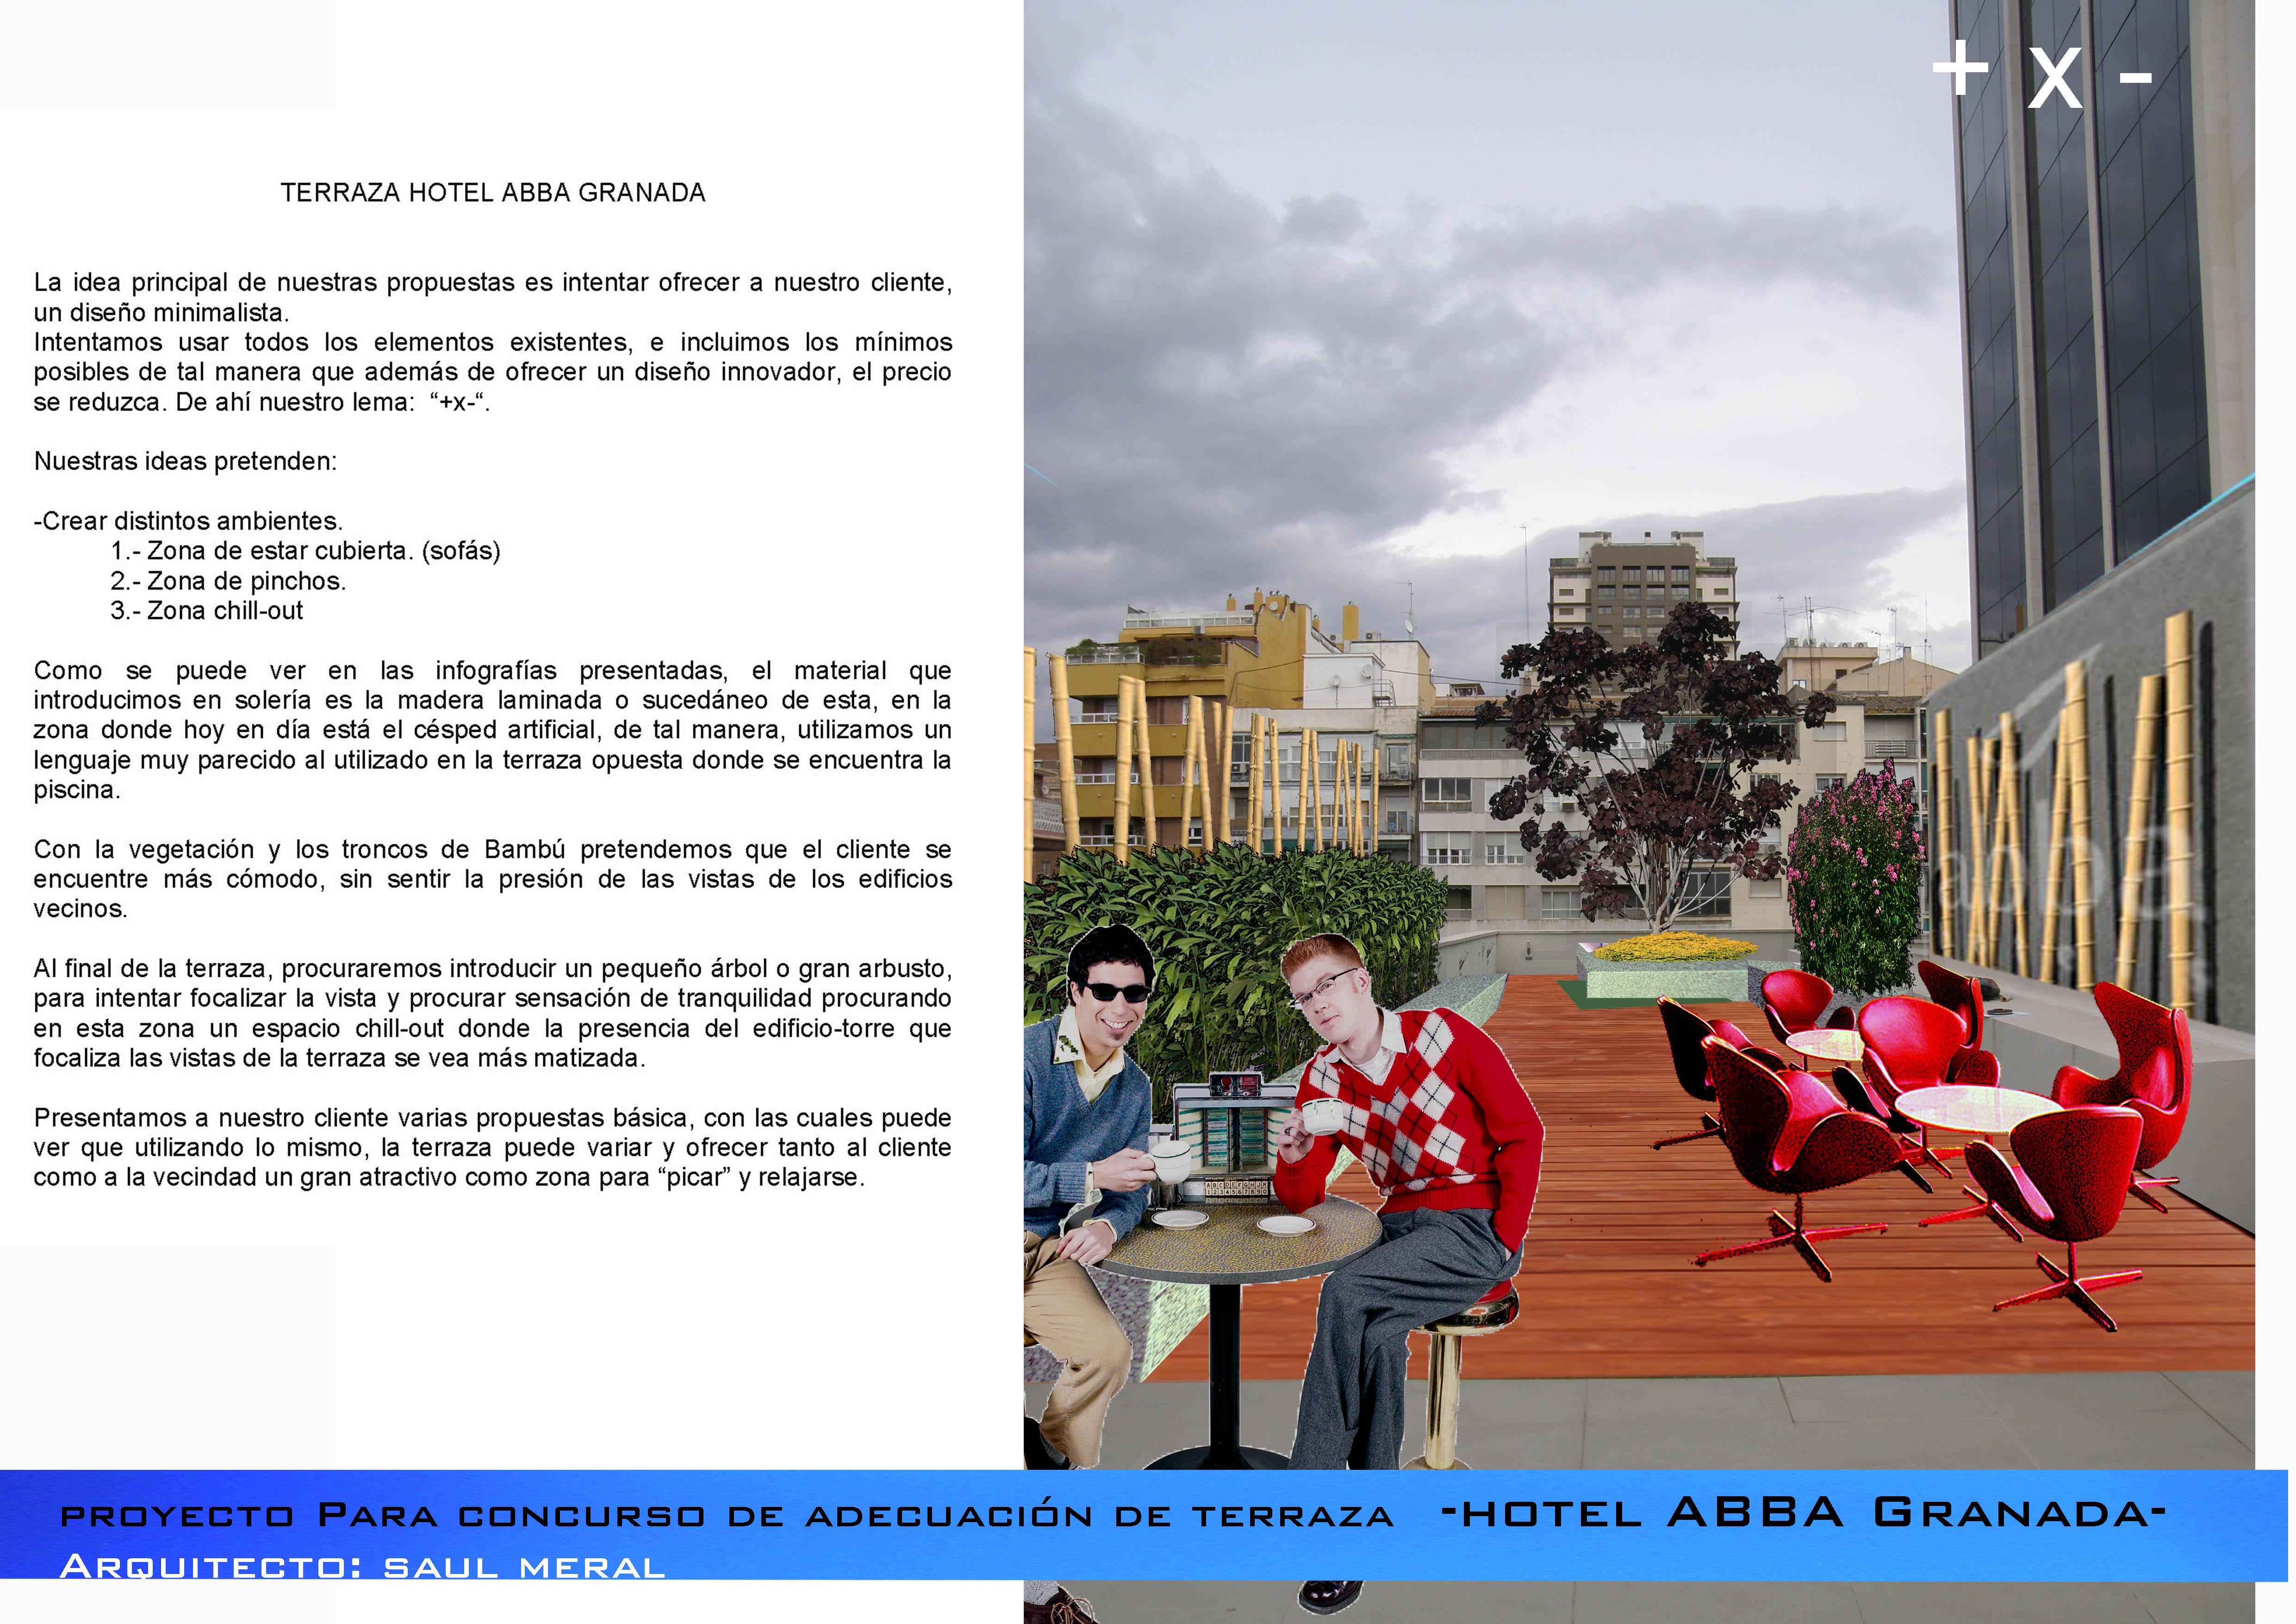 Terraza Hotel ABBA granada 2